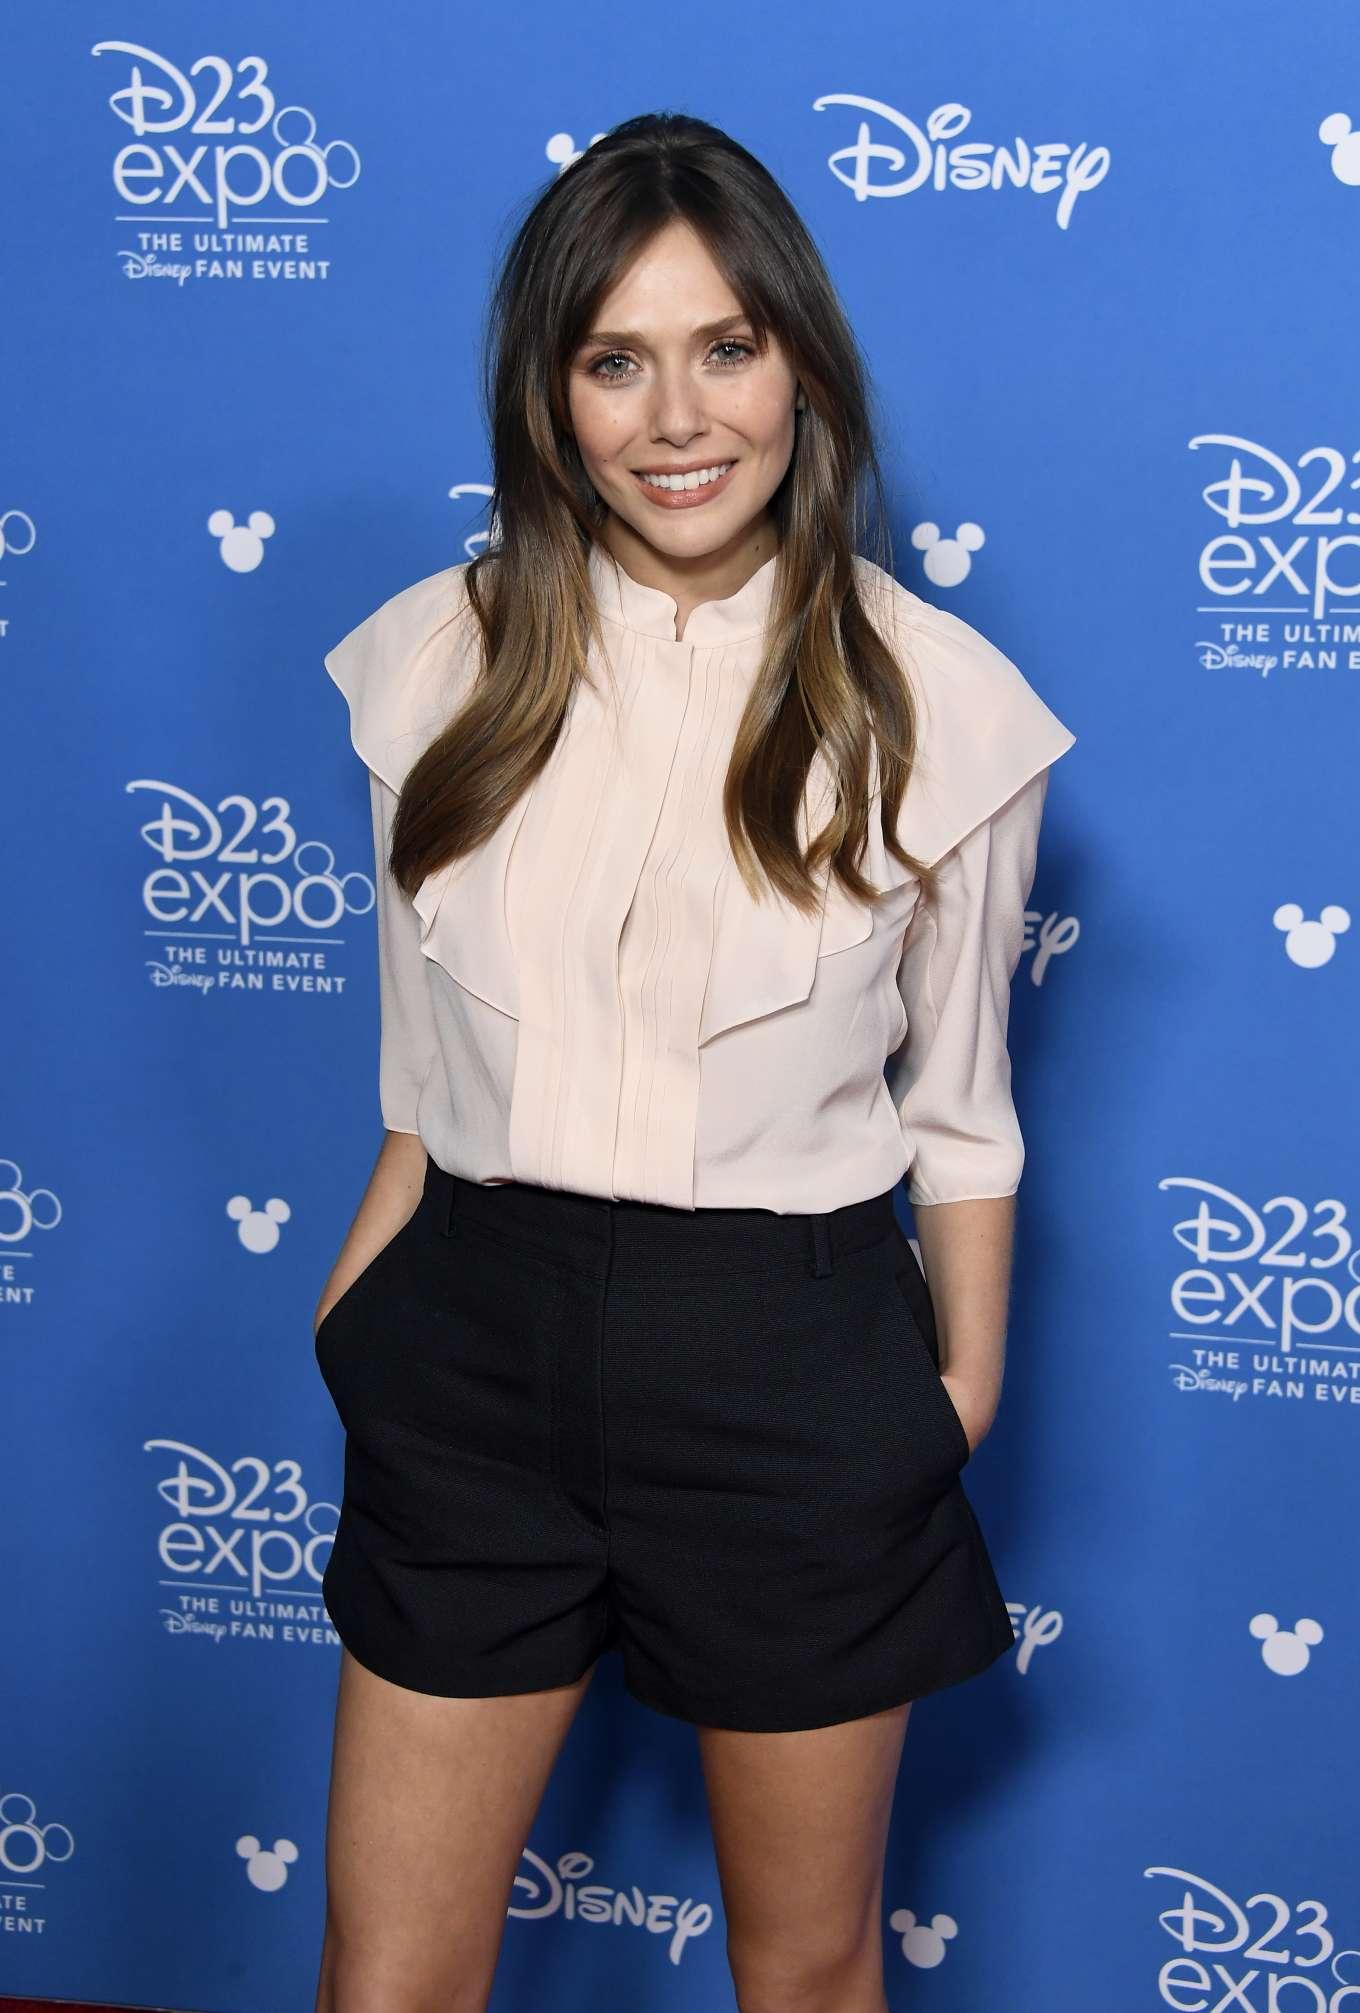 Elizabeth Olsen 2019 : Elizabeth Olsen – Attends D23 Disney event at Anaheim-06